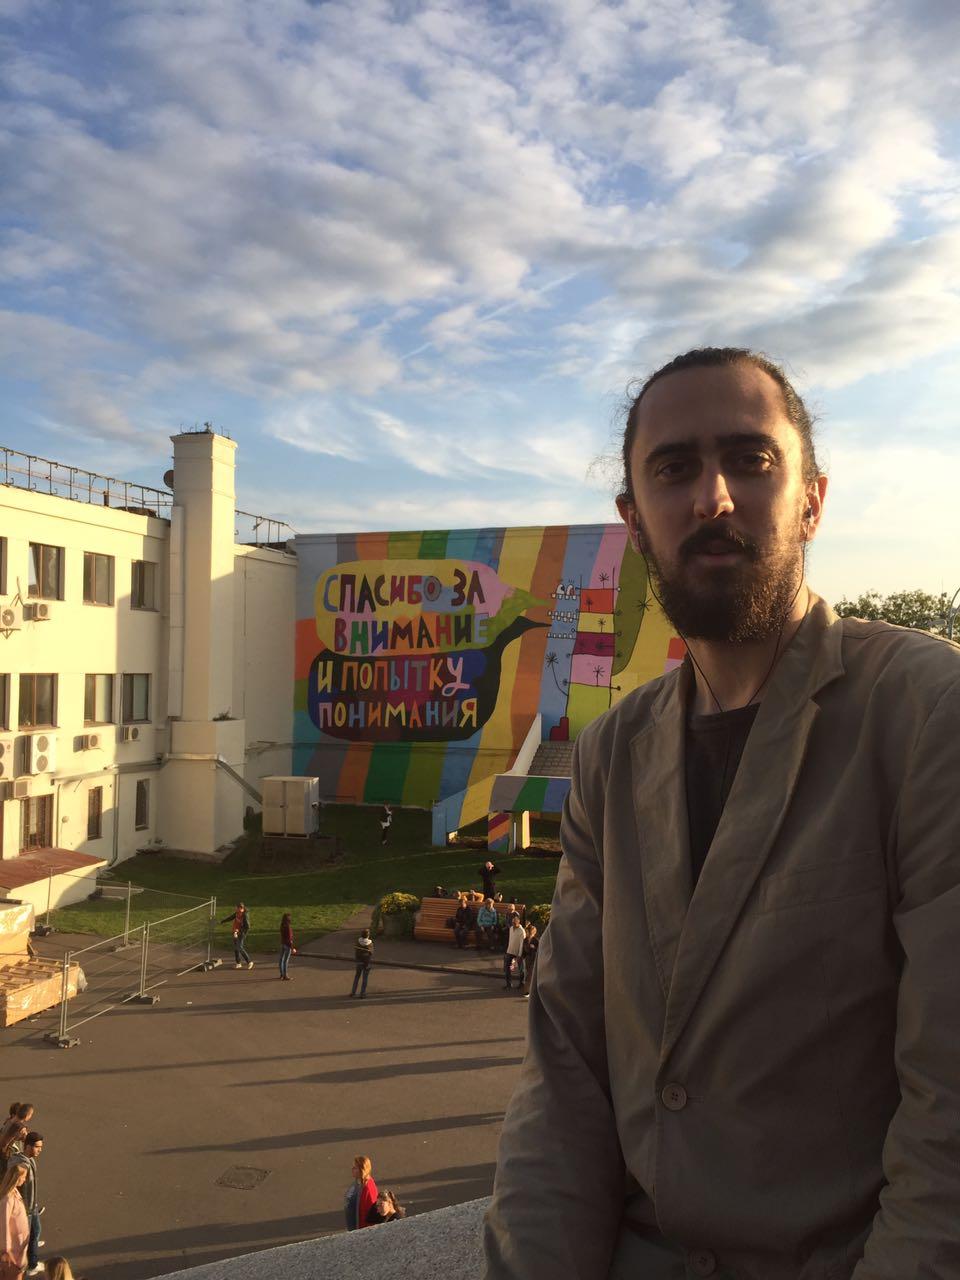 Андрей Беротрон - участник кастинга в 19 сезон